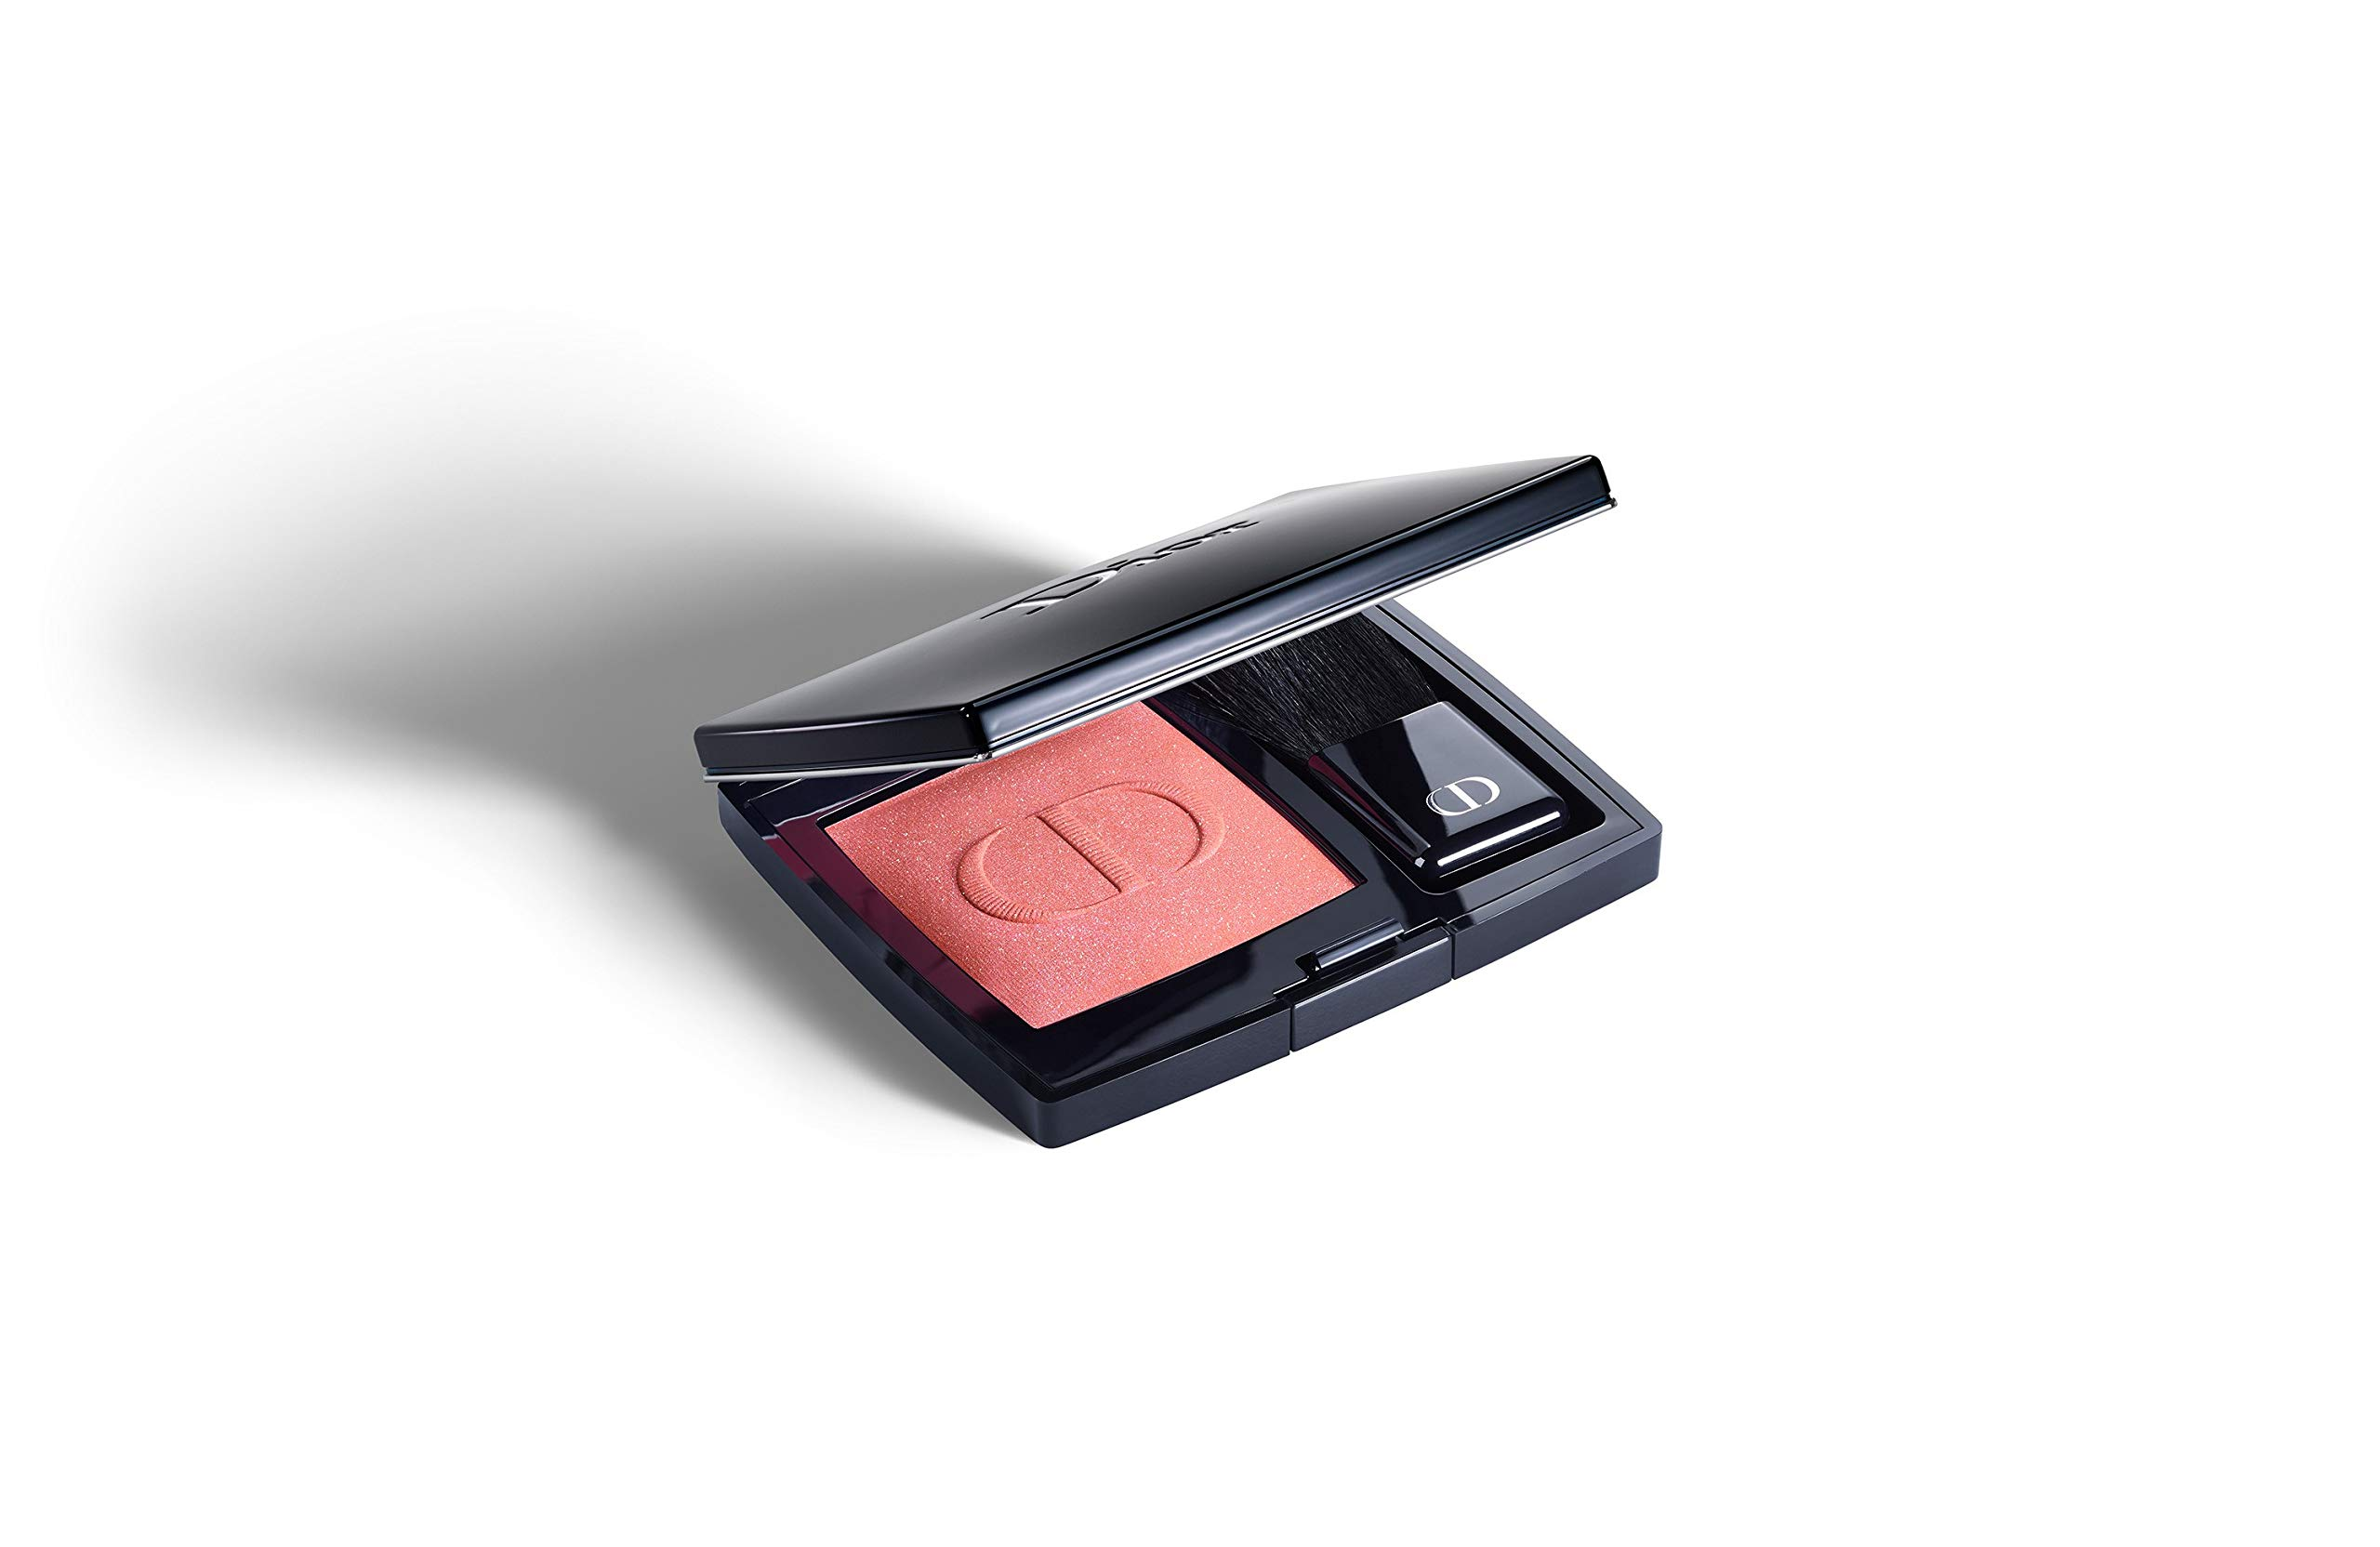 DIOR ROUGE BLUSH COUTURE COLOUR LONG-WEAR POWDER BLUSH # 219 ROSE MONTAIGNE by Dior